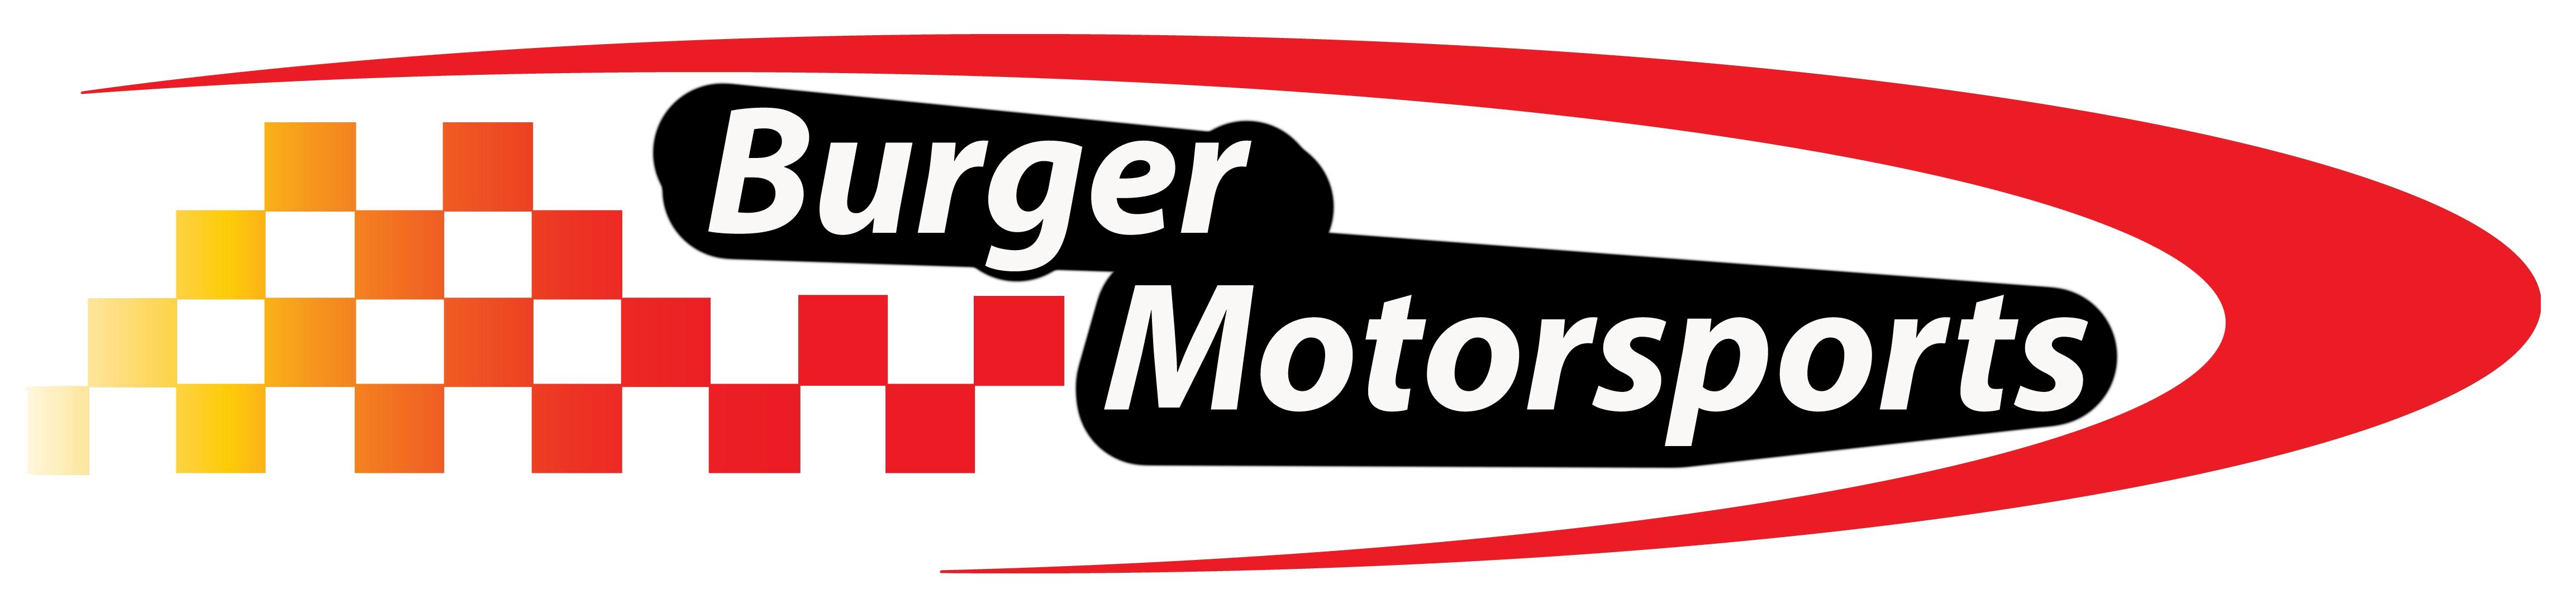 Burger Motorsports Parts